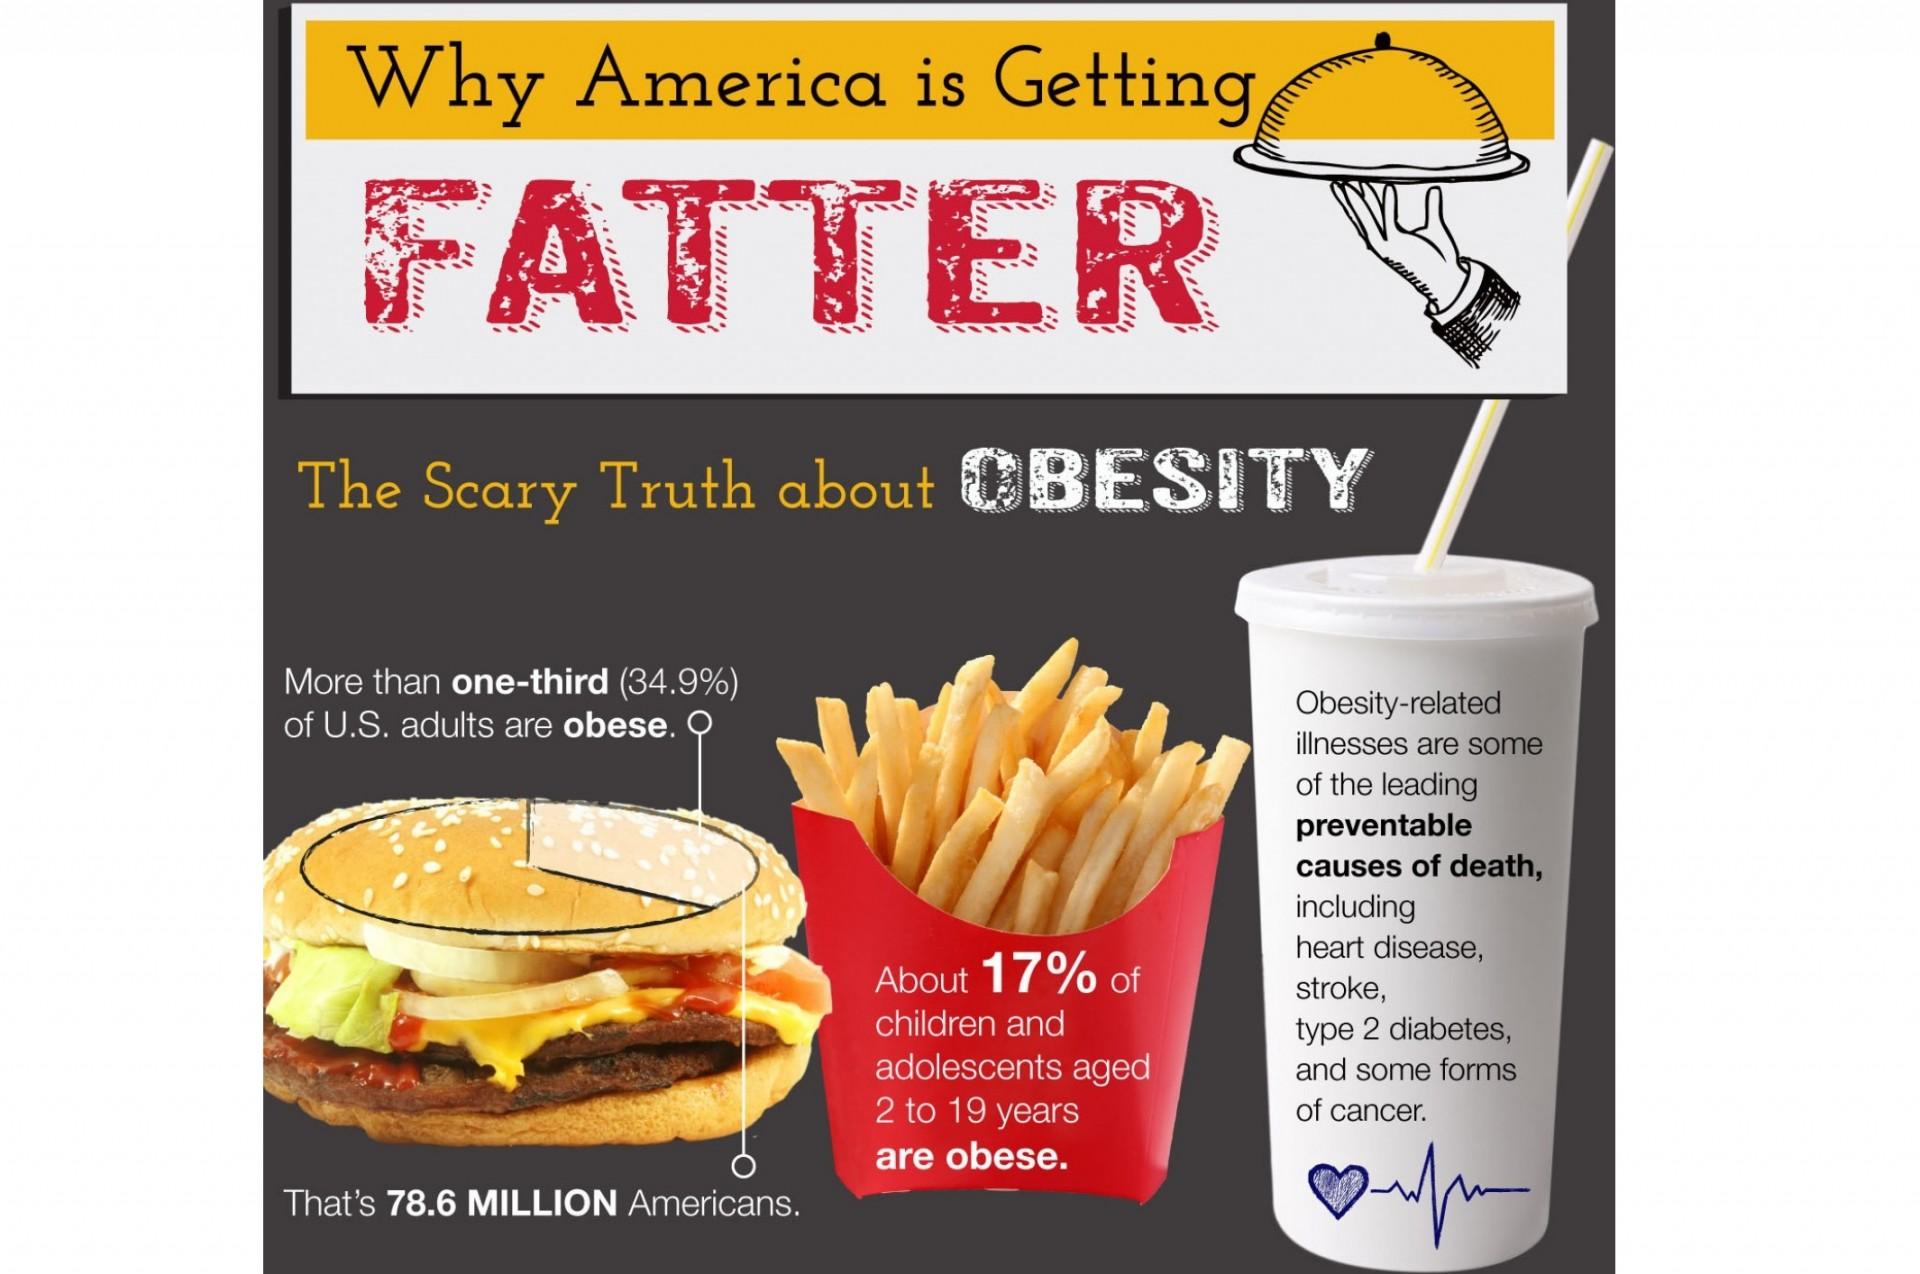 021 Fast Food Essay Fact Stunning Topics Argumentative Introduction Titles 1920